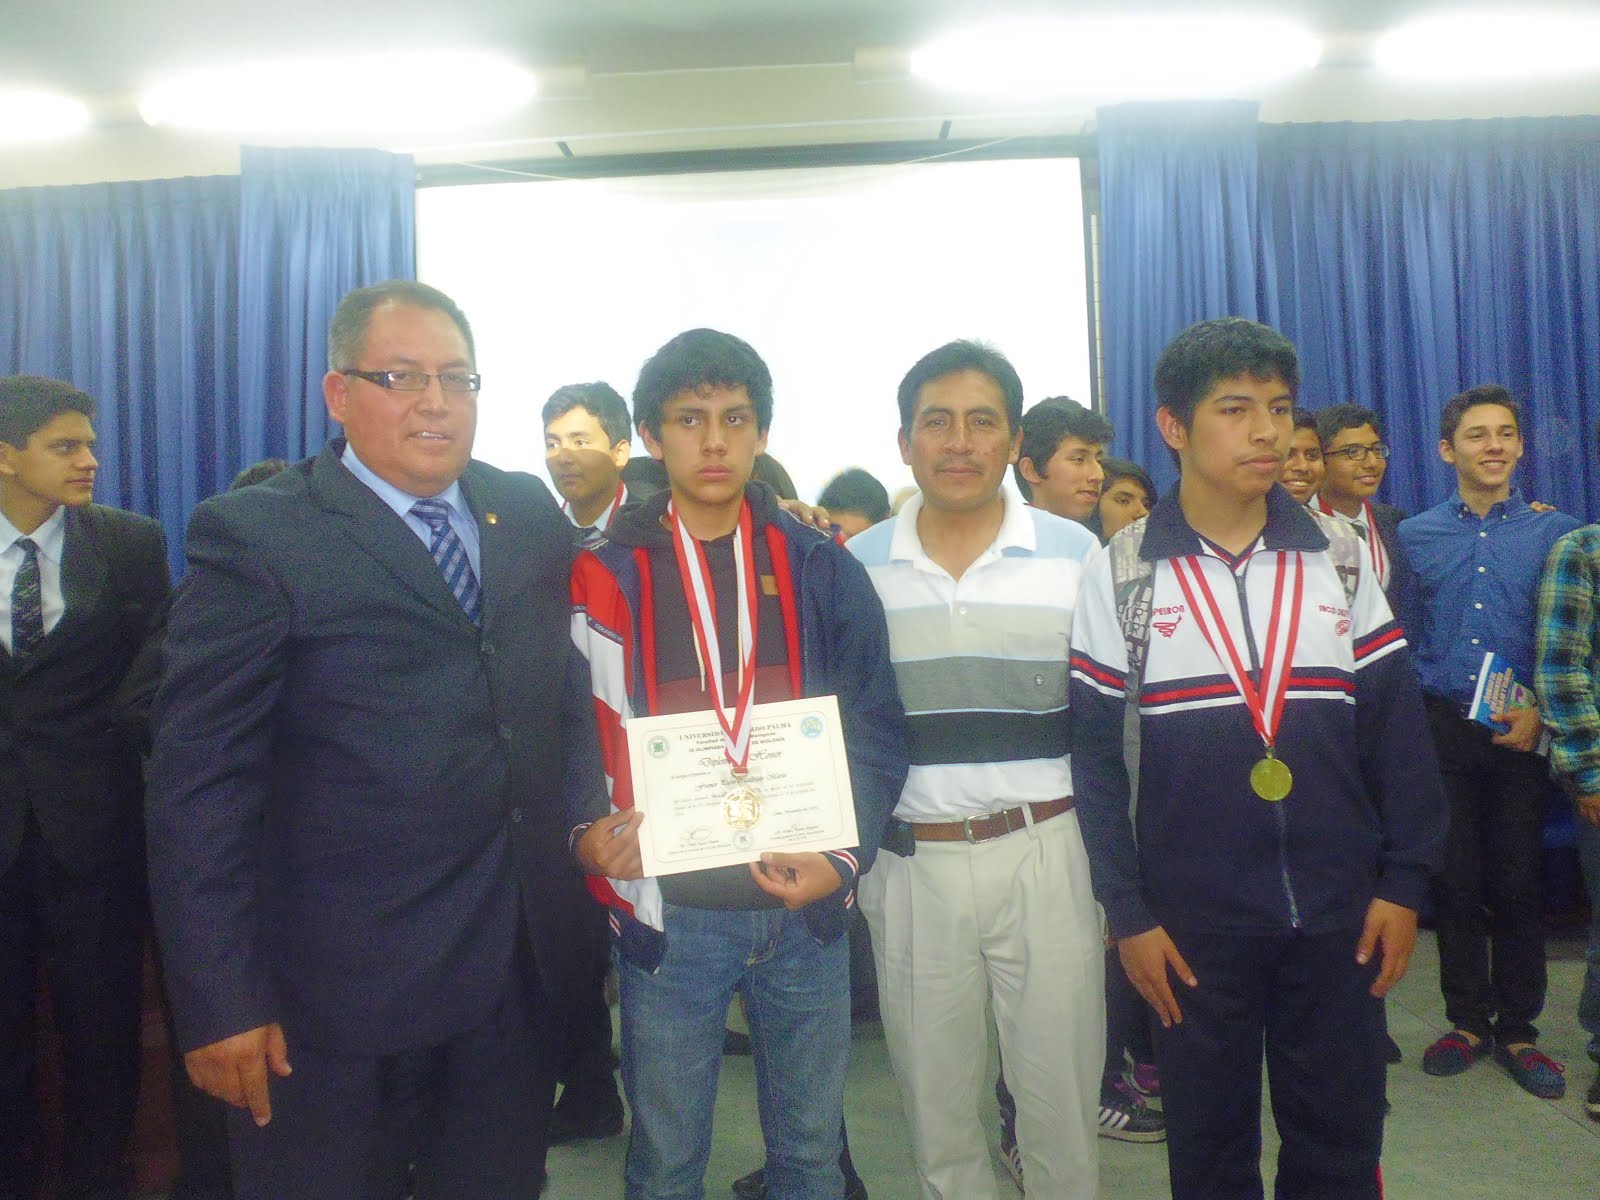 IX OLIMPIADA PERUANA DE BIOLOGÍA OPB 2015.